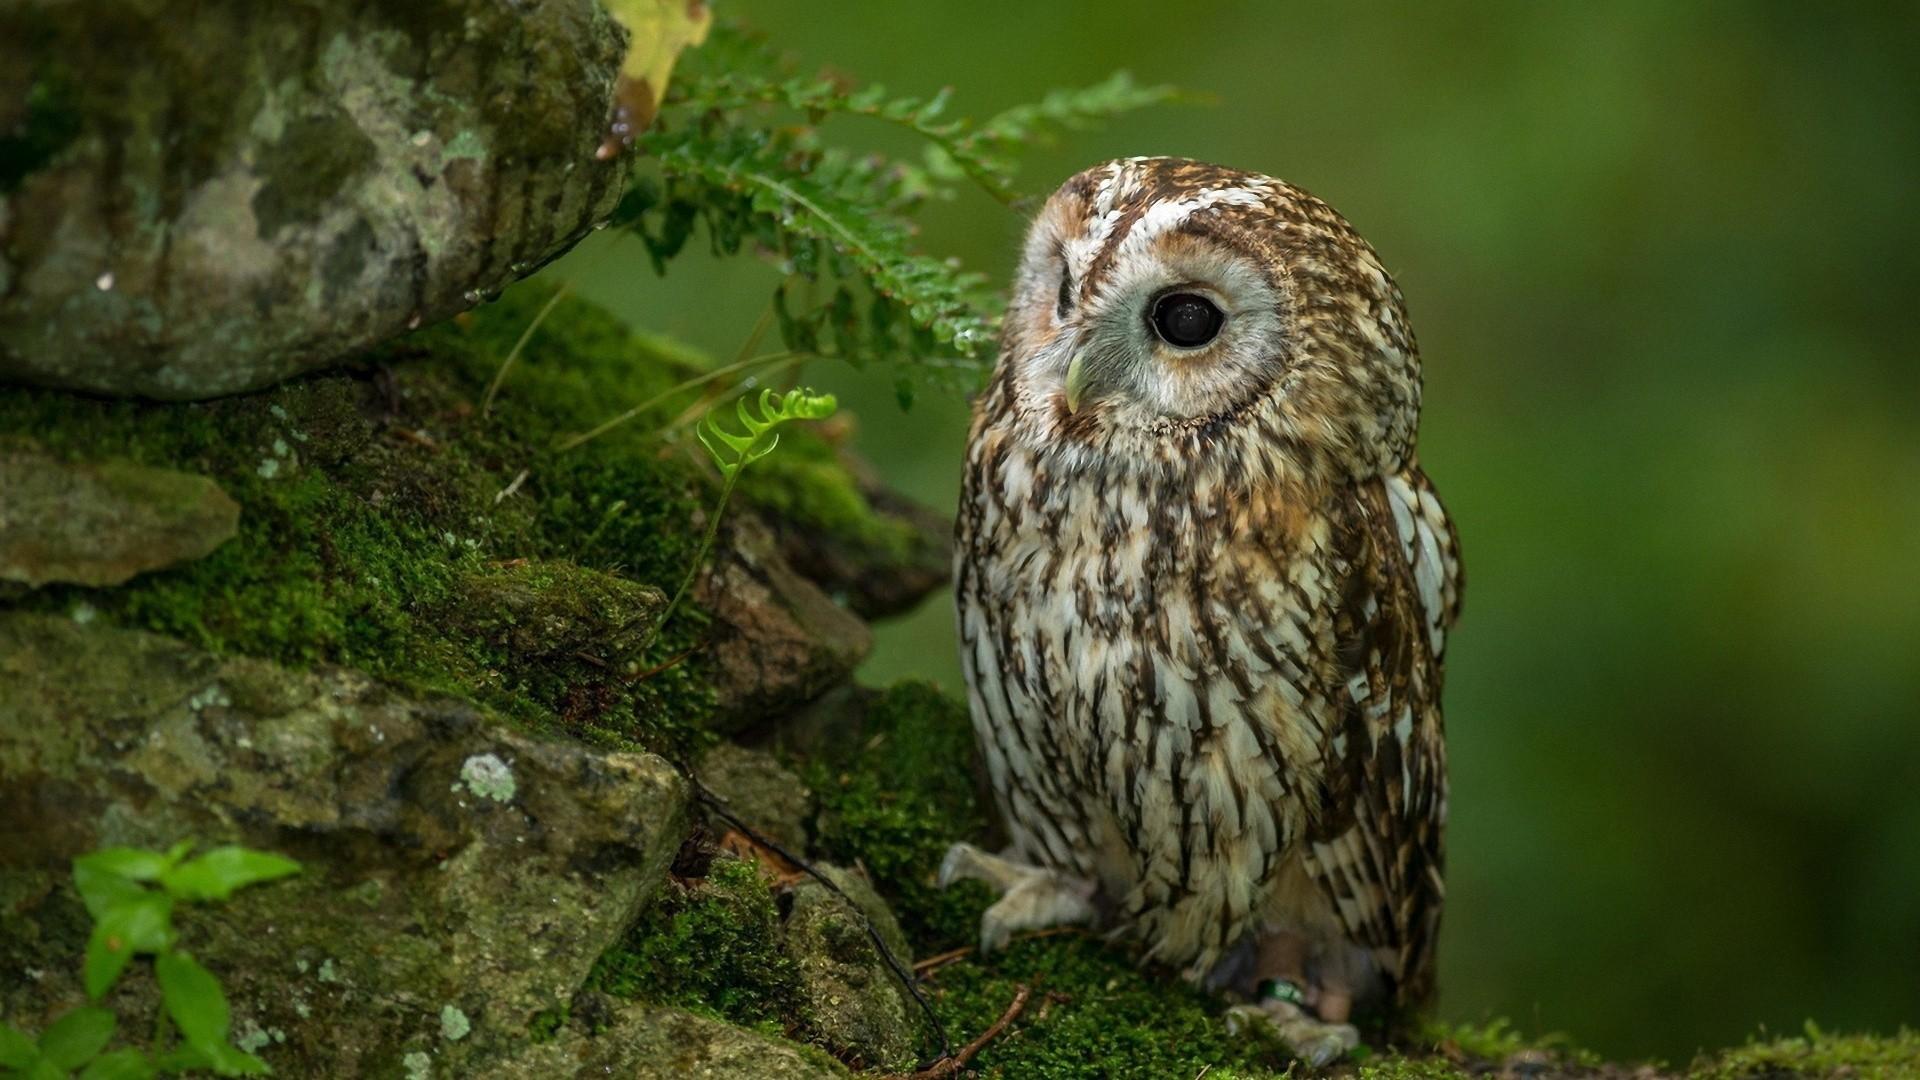 Cute Alone Owl Wallpaper